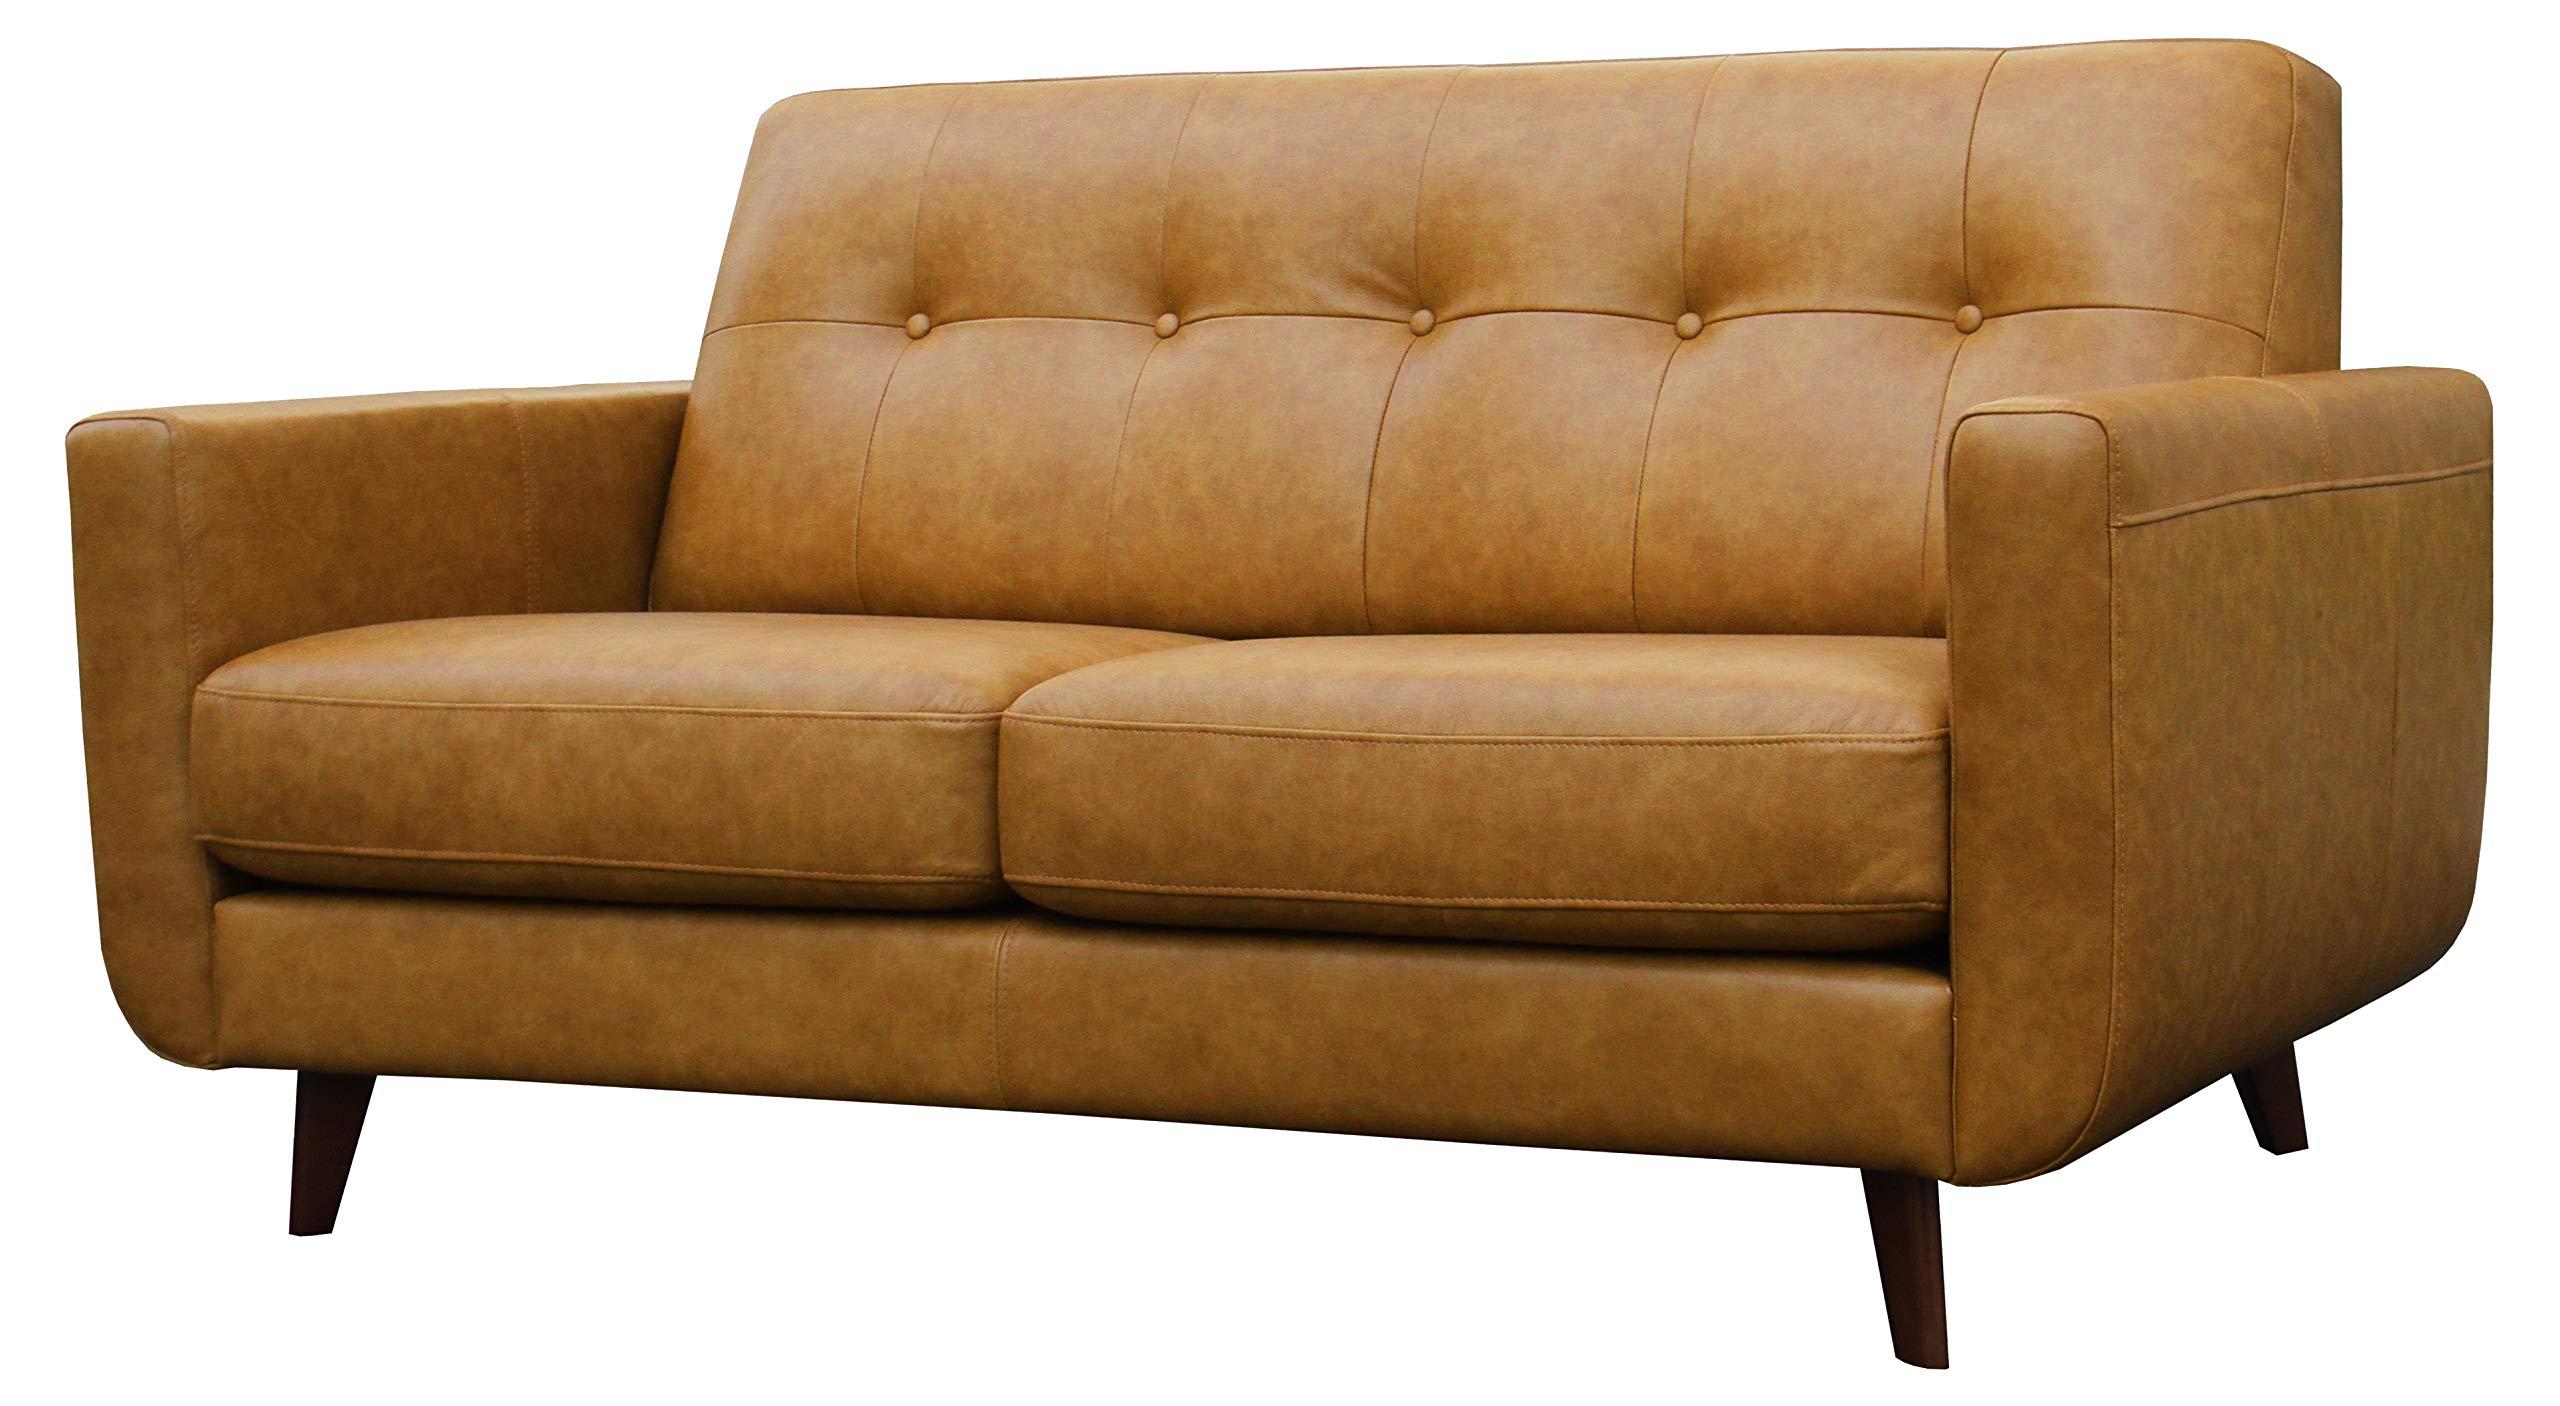 Rivet Sloane Modern Leather Loveseat with Tufted Back, 64.2''W, Caramel by Rivet